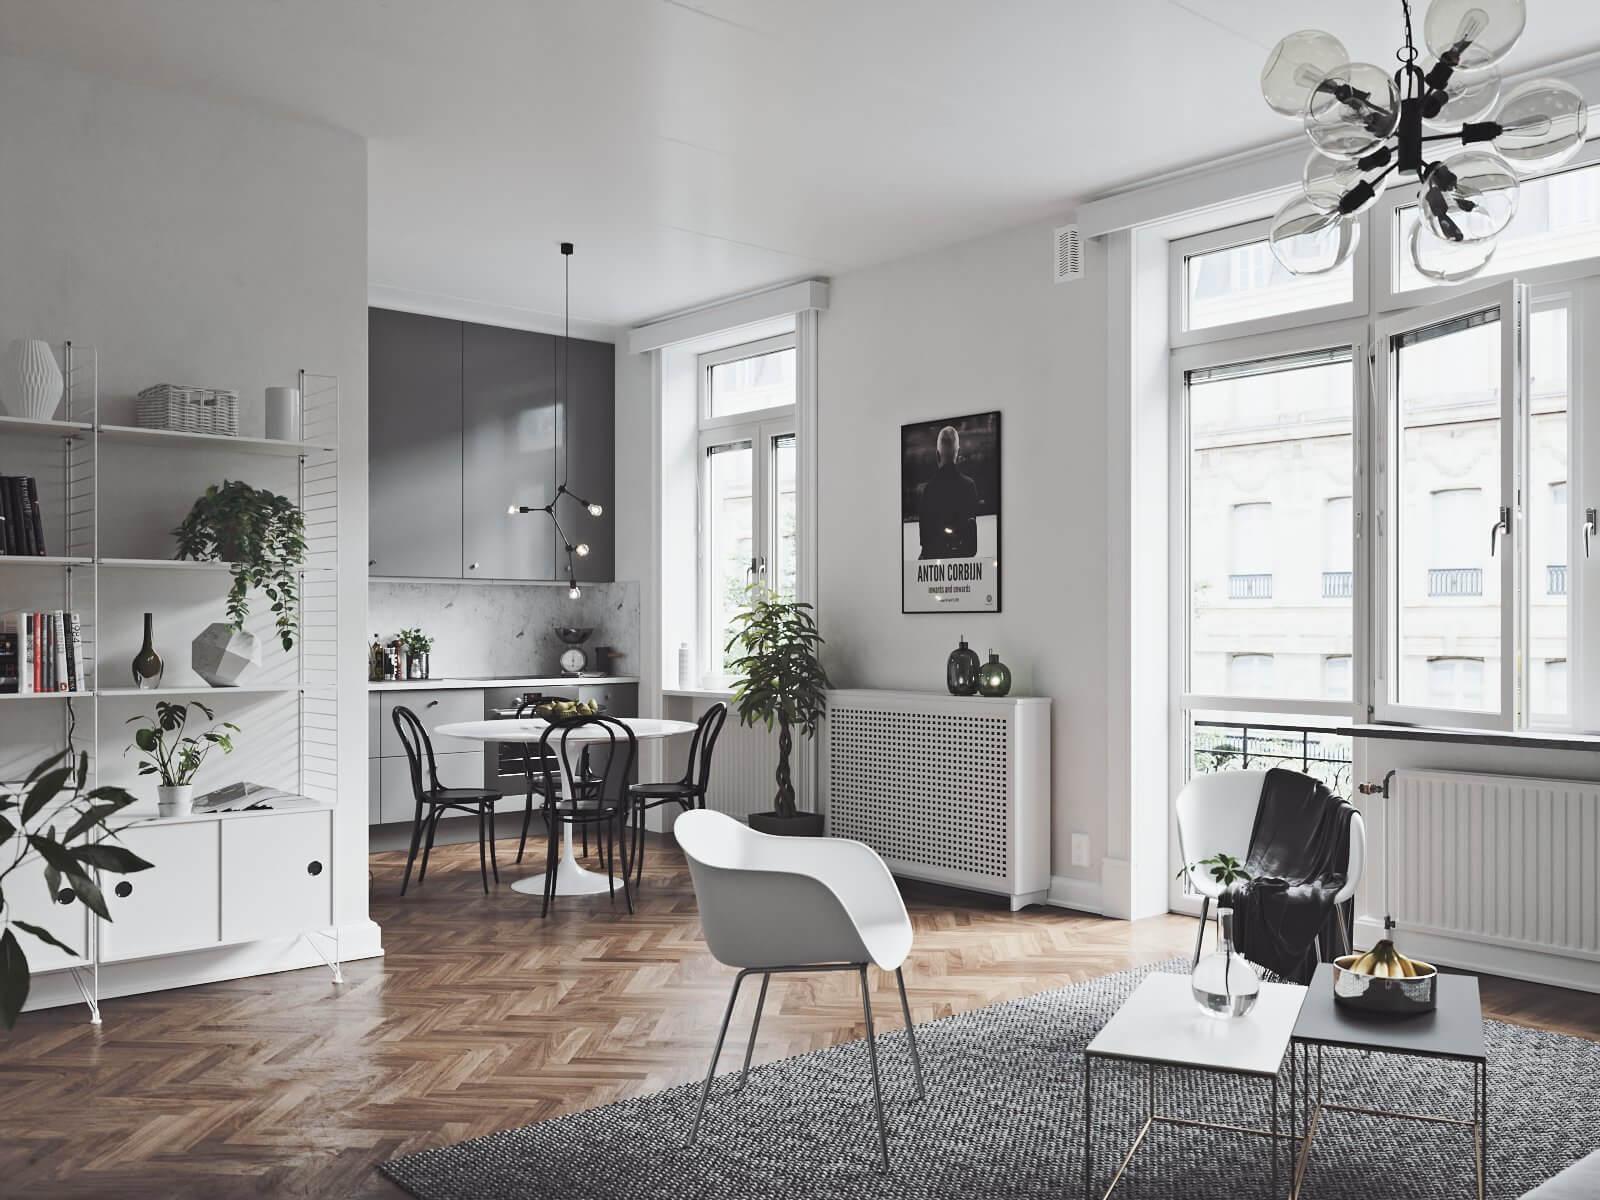 Scandinavian flat kitchen dining room - cgi visualization